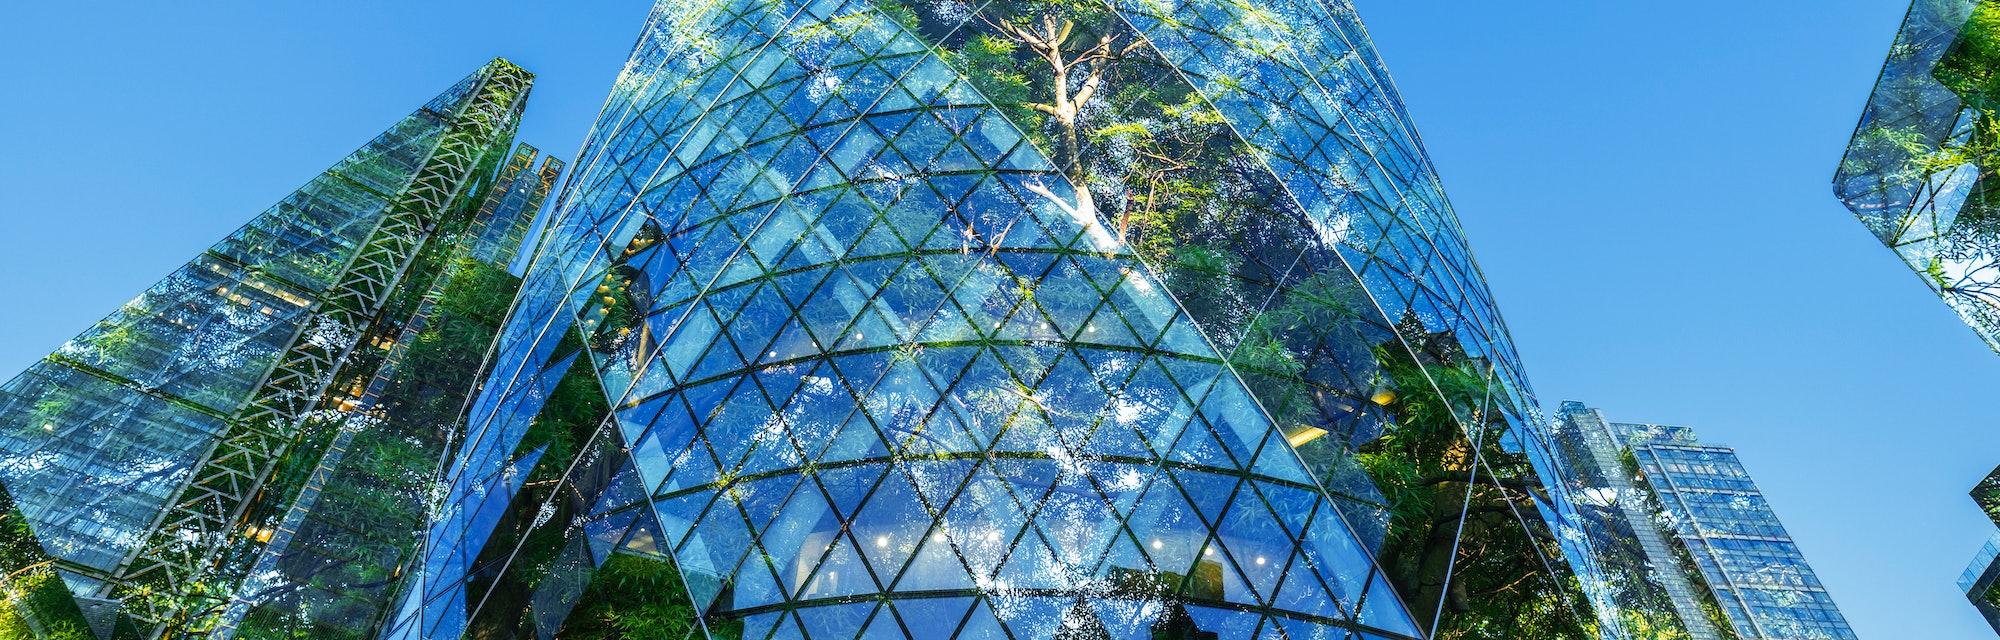 eco-friendly city